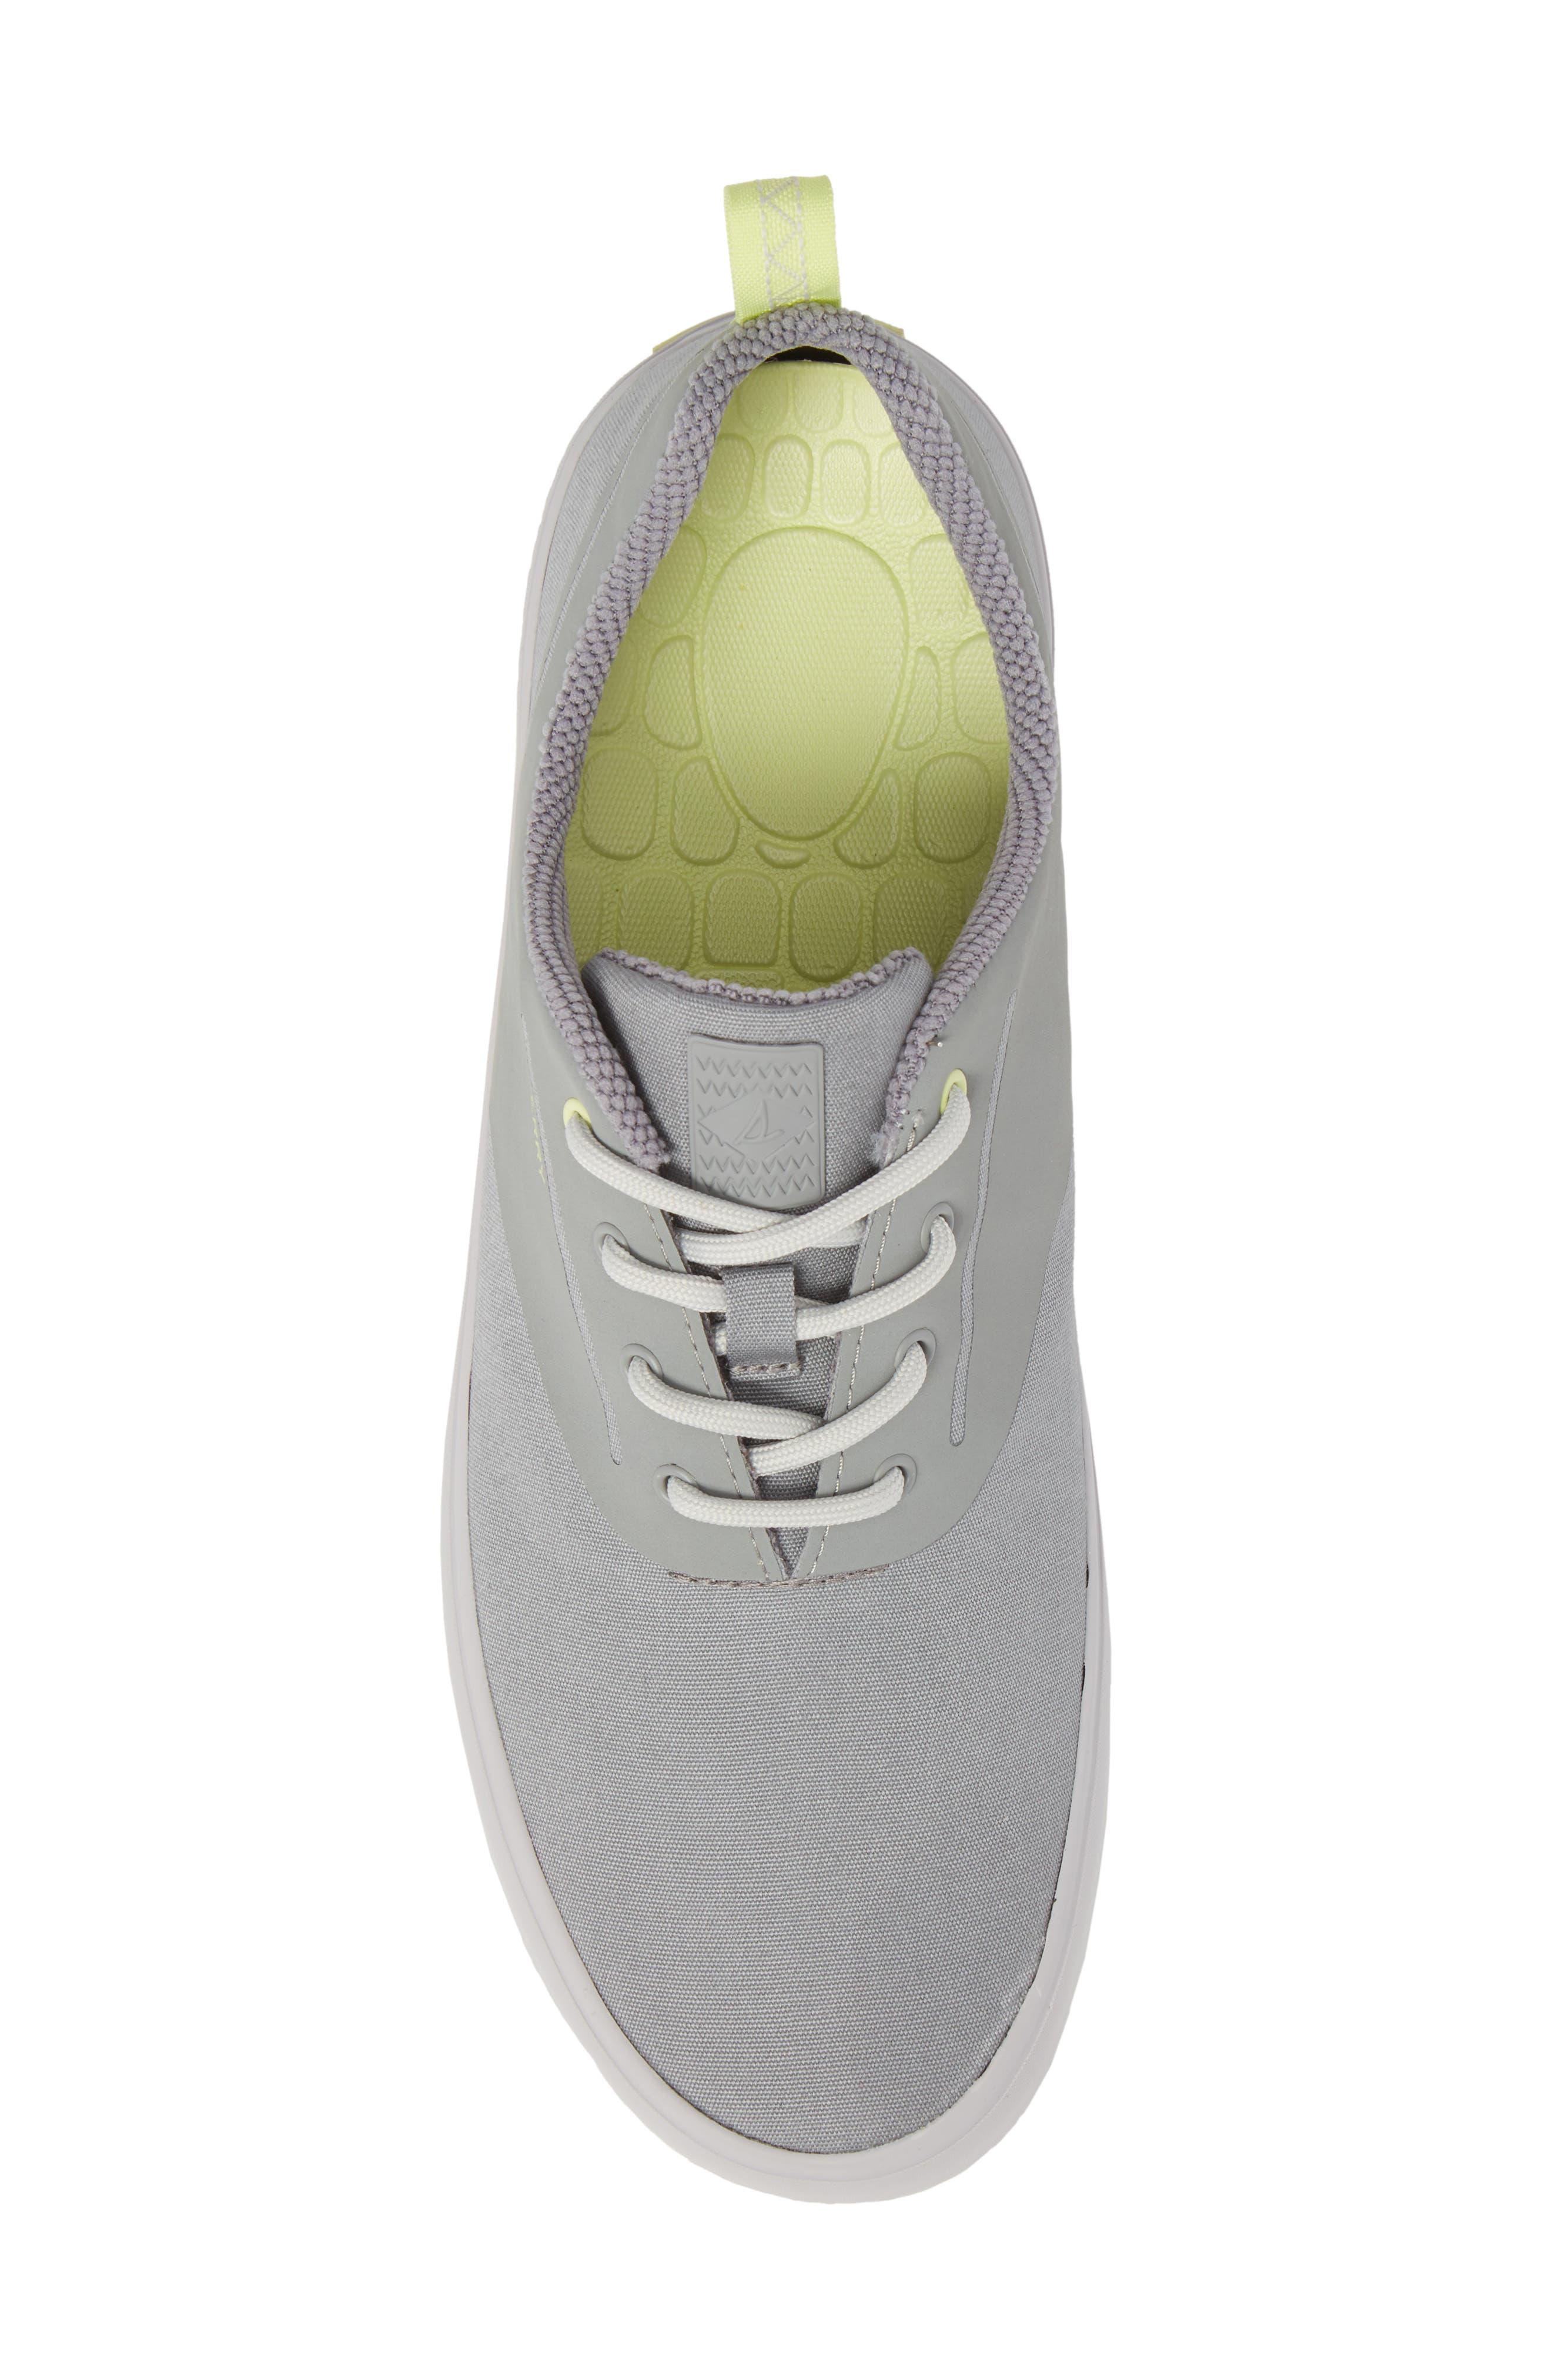 SPERRY, Flex Deck CVO Sneaker, Alternate thumbnail 5, color, GREY